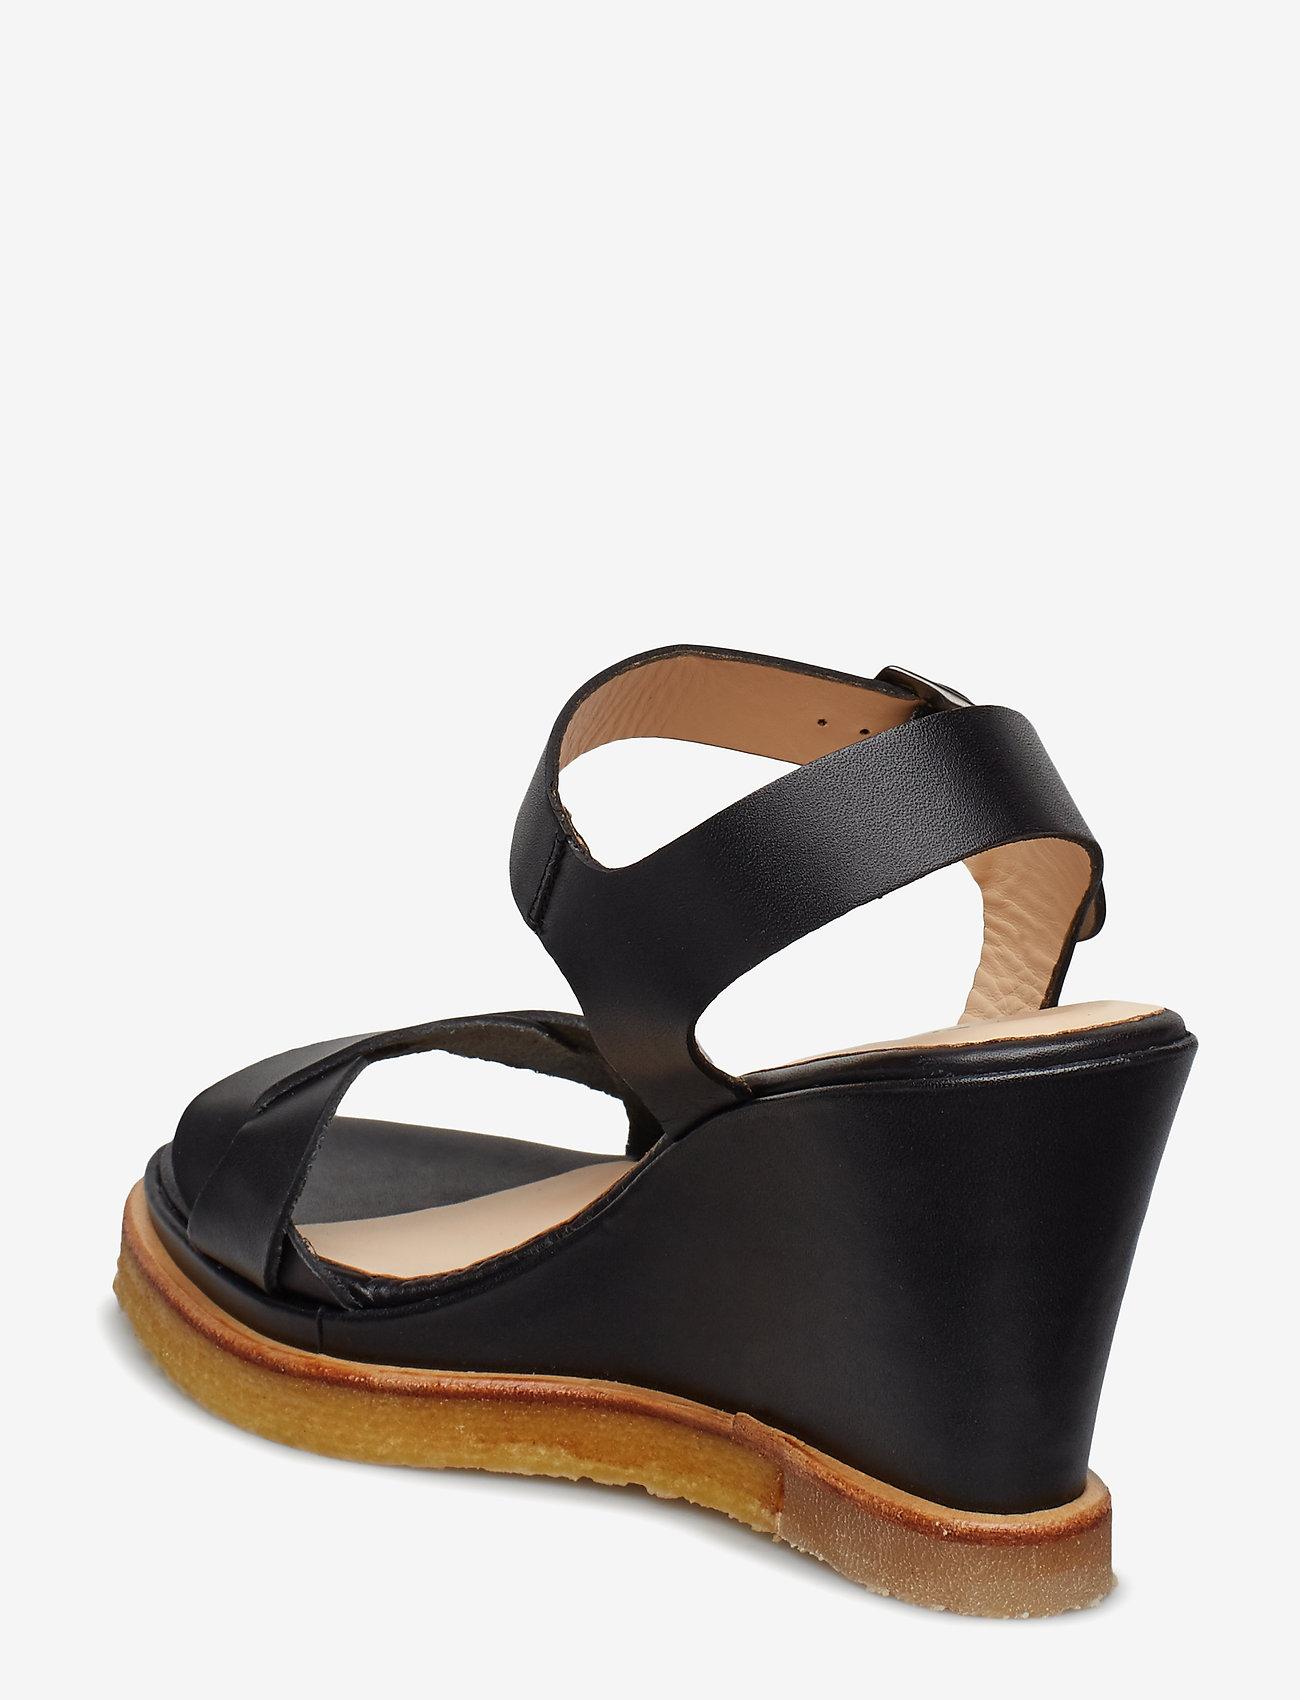 Sandals - Wedge (1785 Black) - ANGULUS